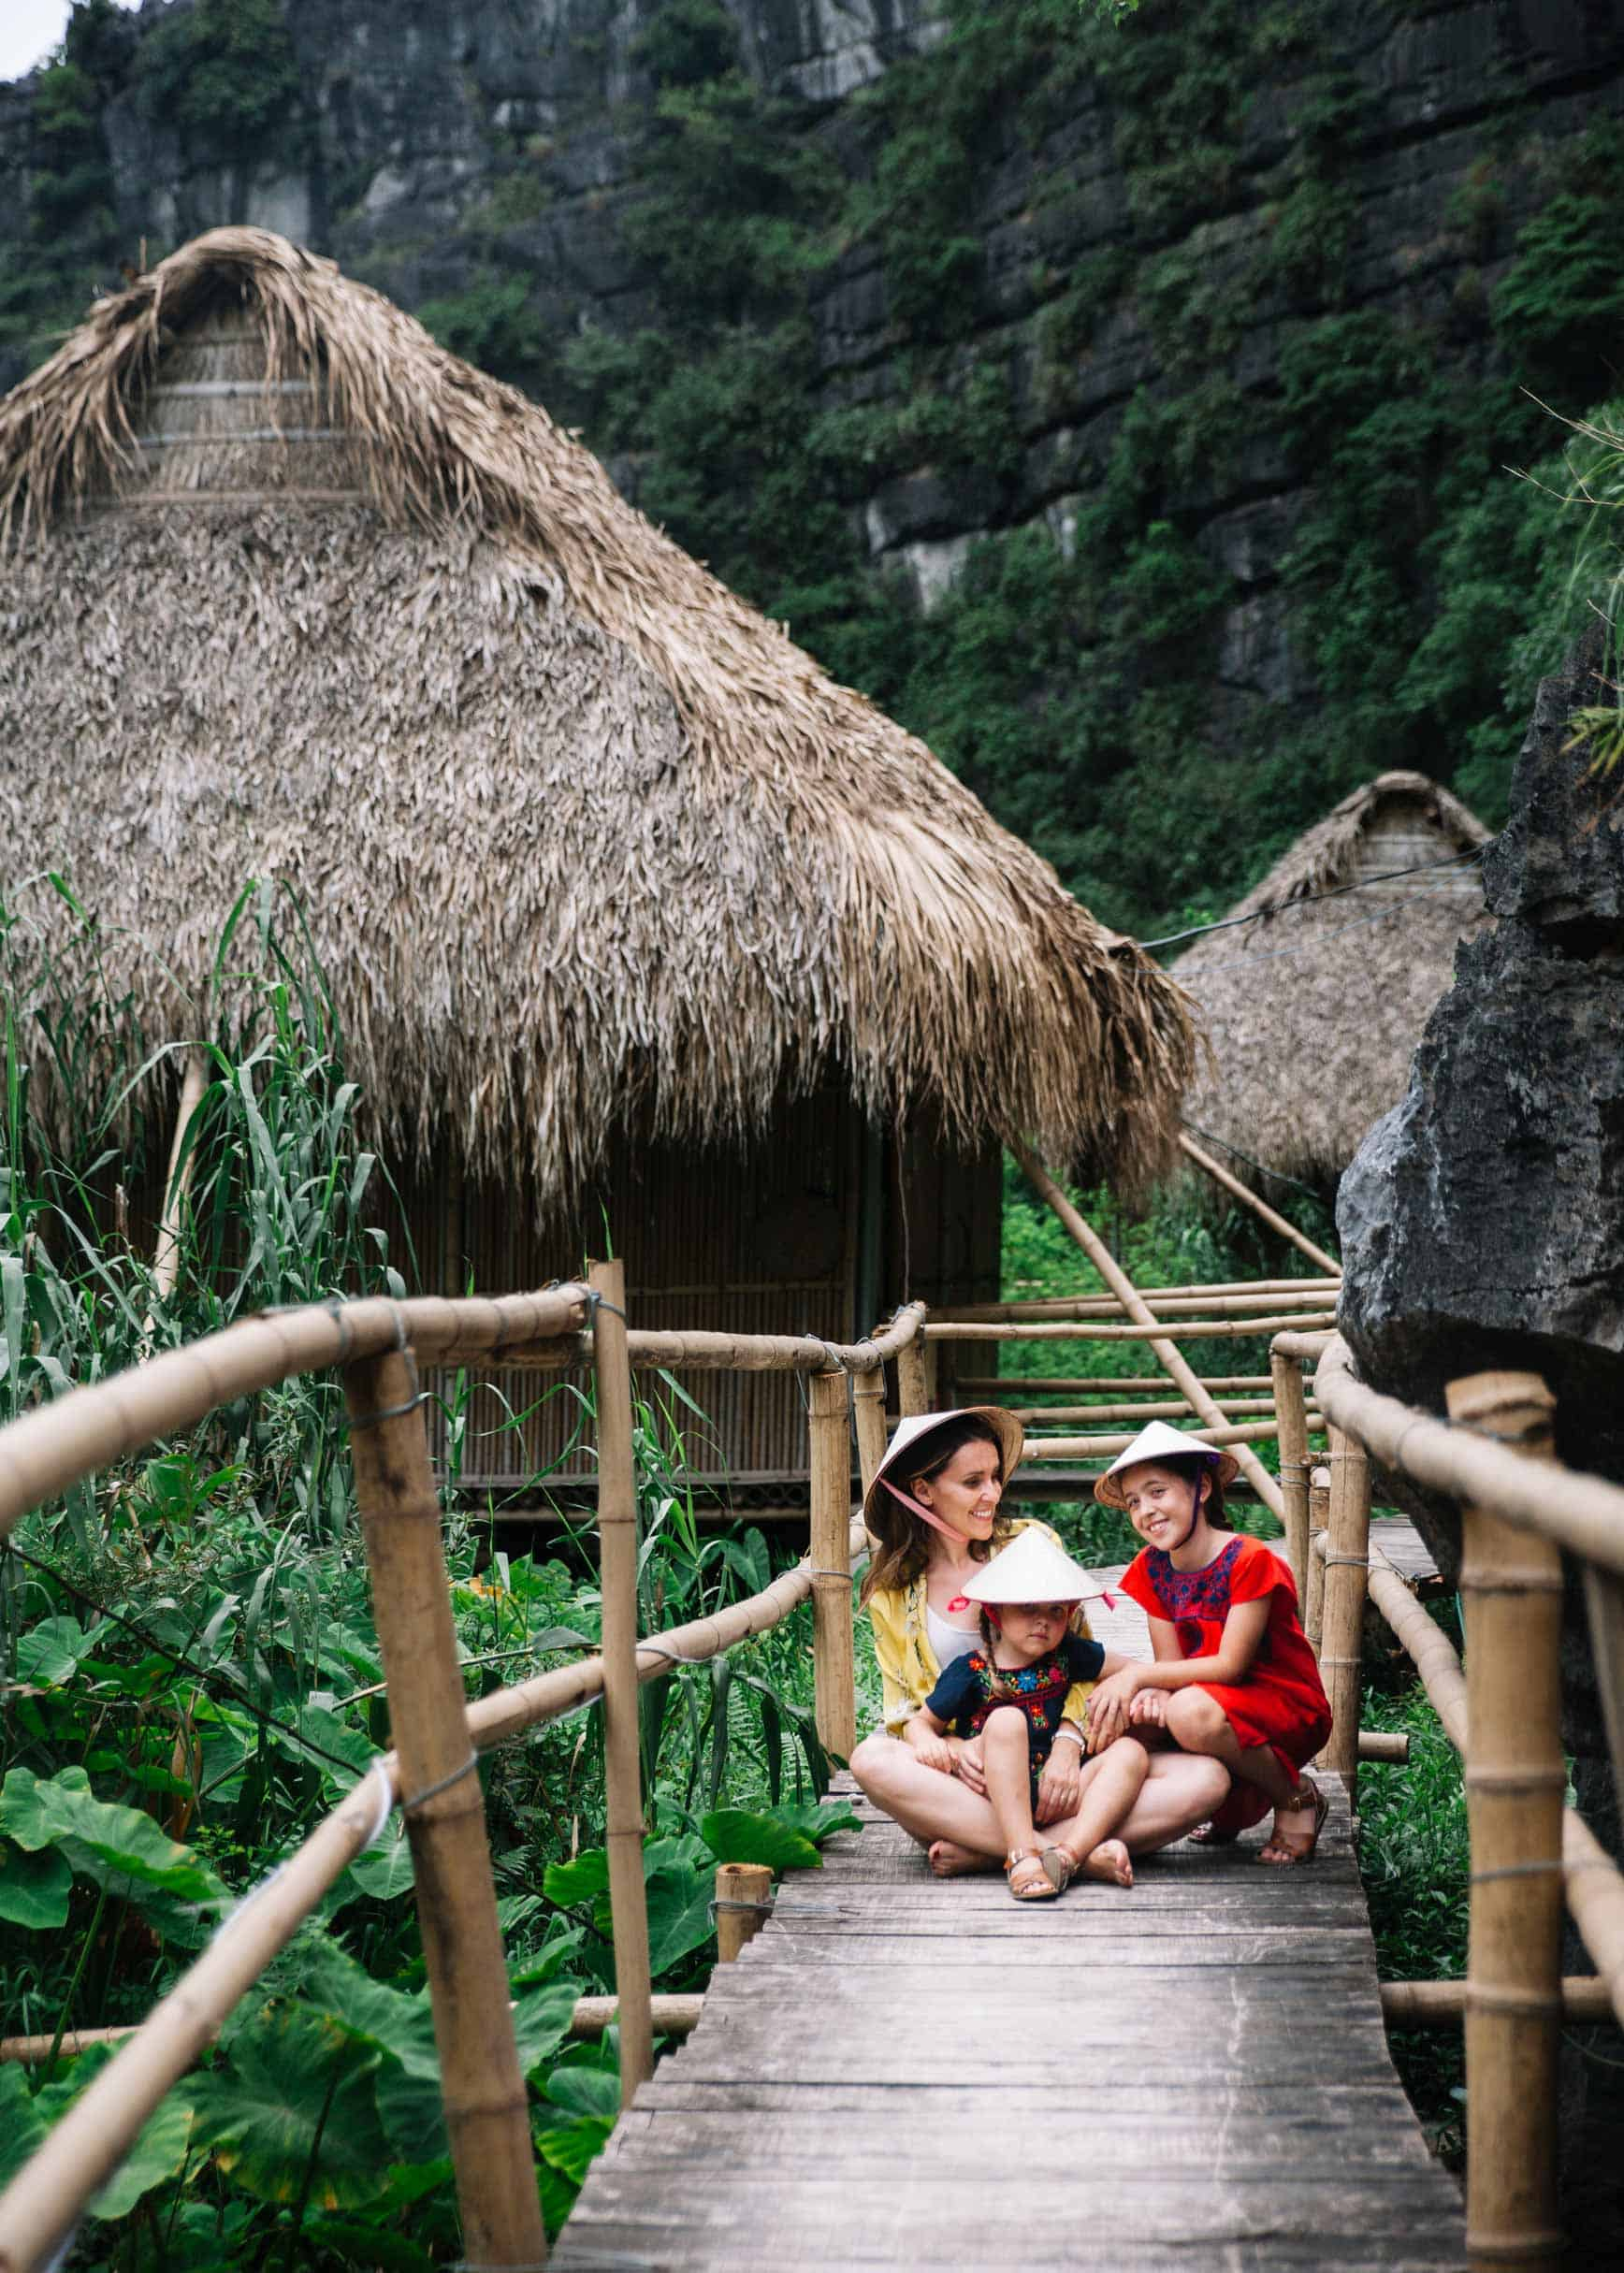 Vietnam con niños - Nguyen Shack Ninh Binh